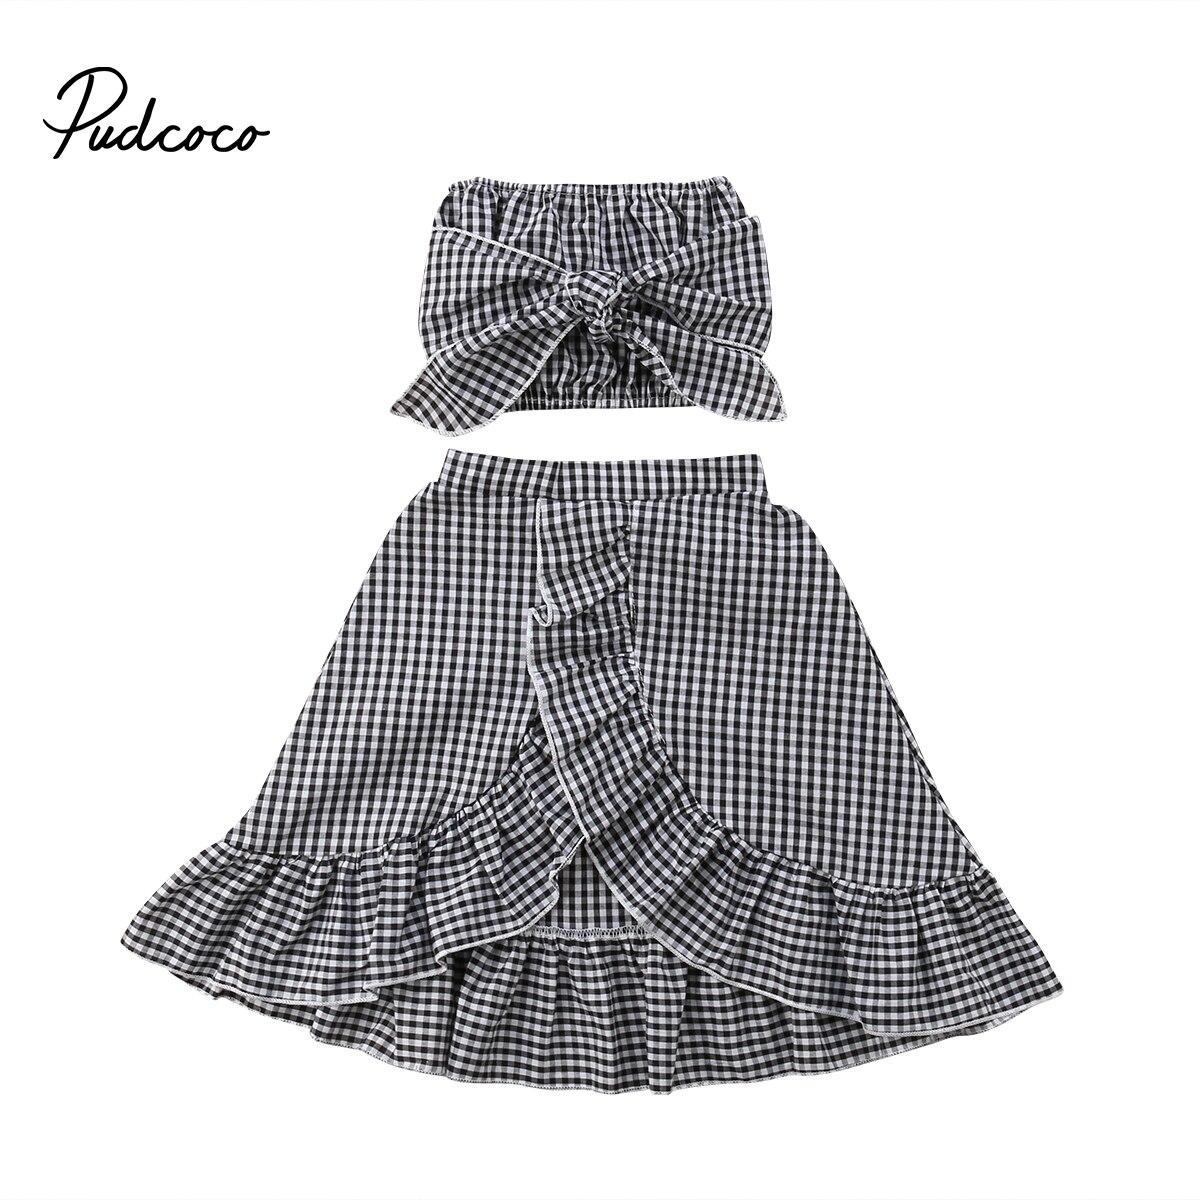 Pudcoco Toddler Baby Girls Summer Clothing Set Off Shoulder Crop Tops+Ruffle Skirt Dress Sundress Kids Children Plaid Boutique